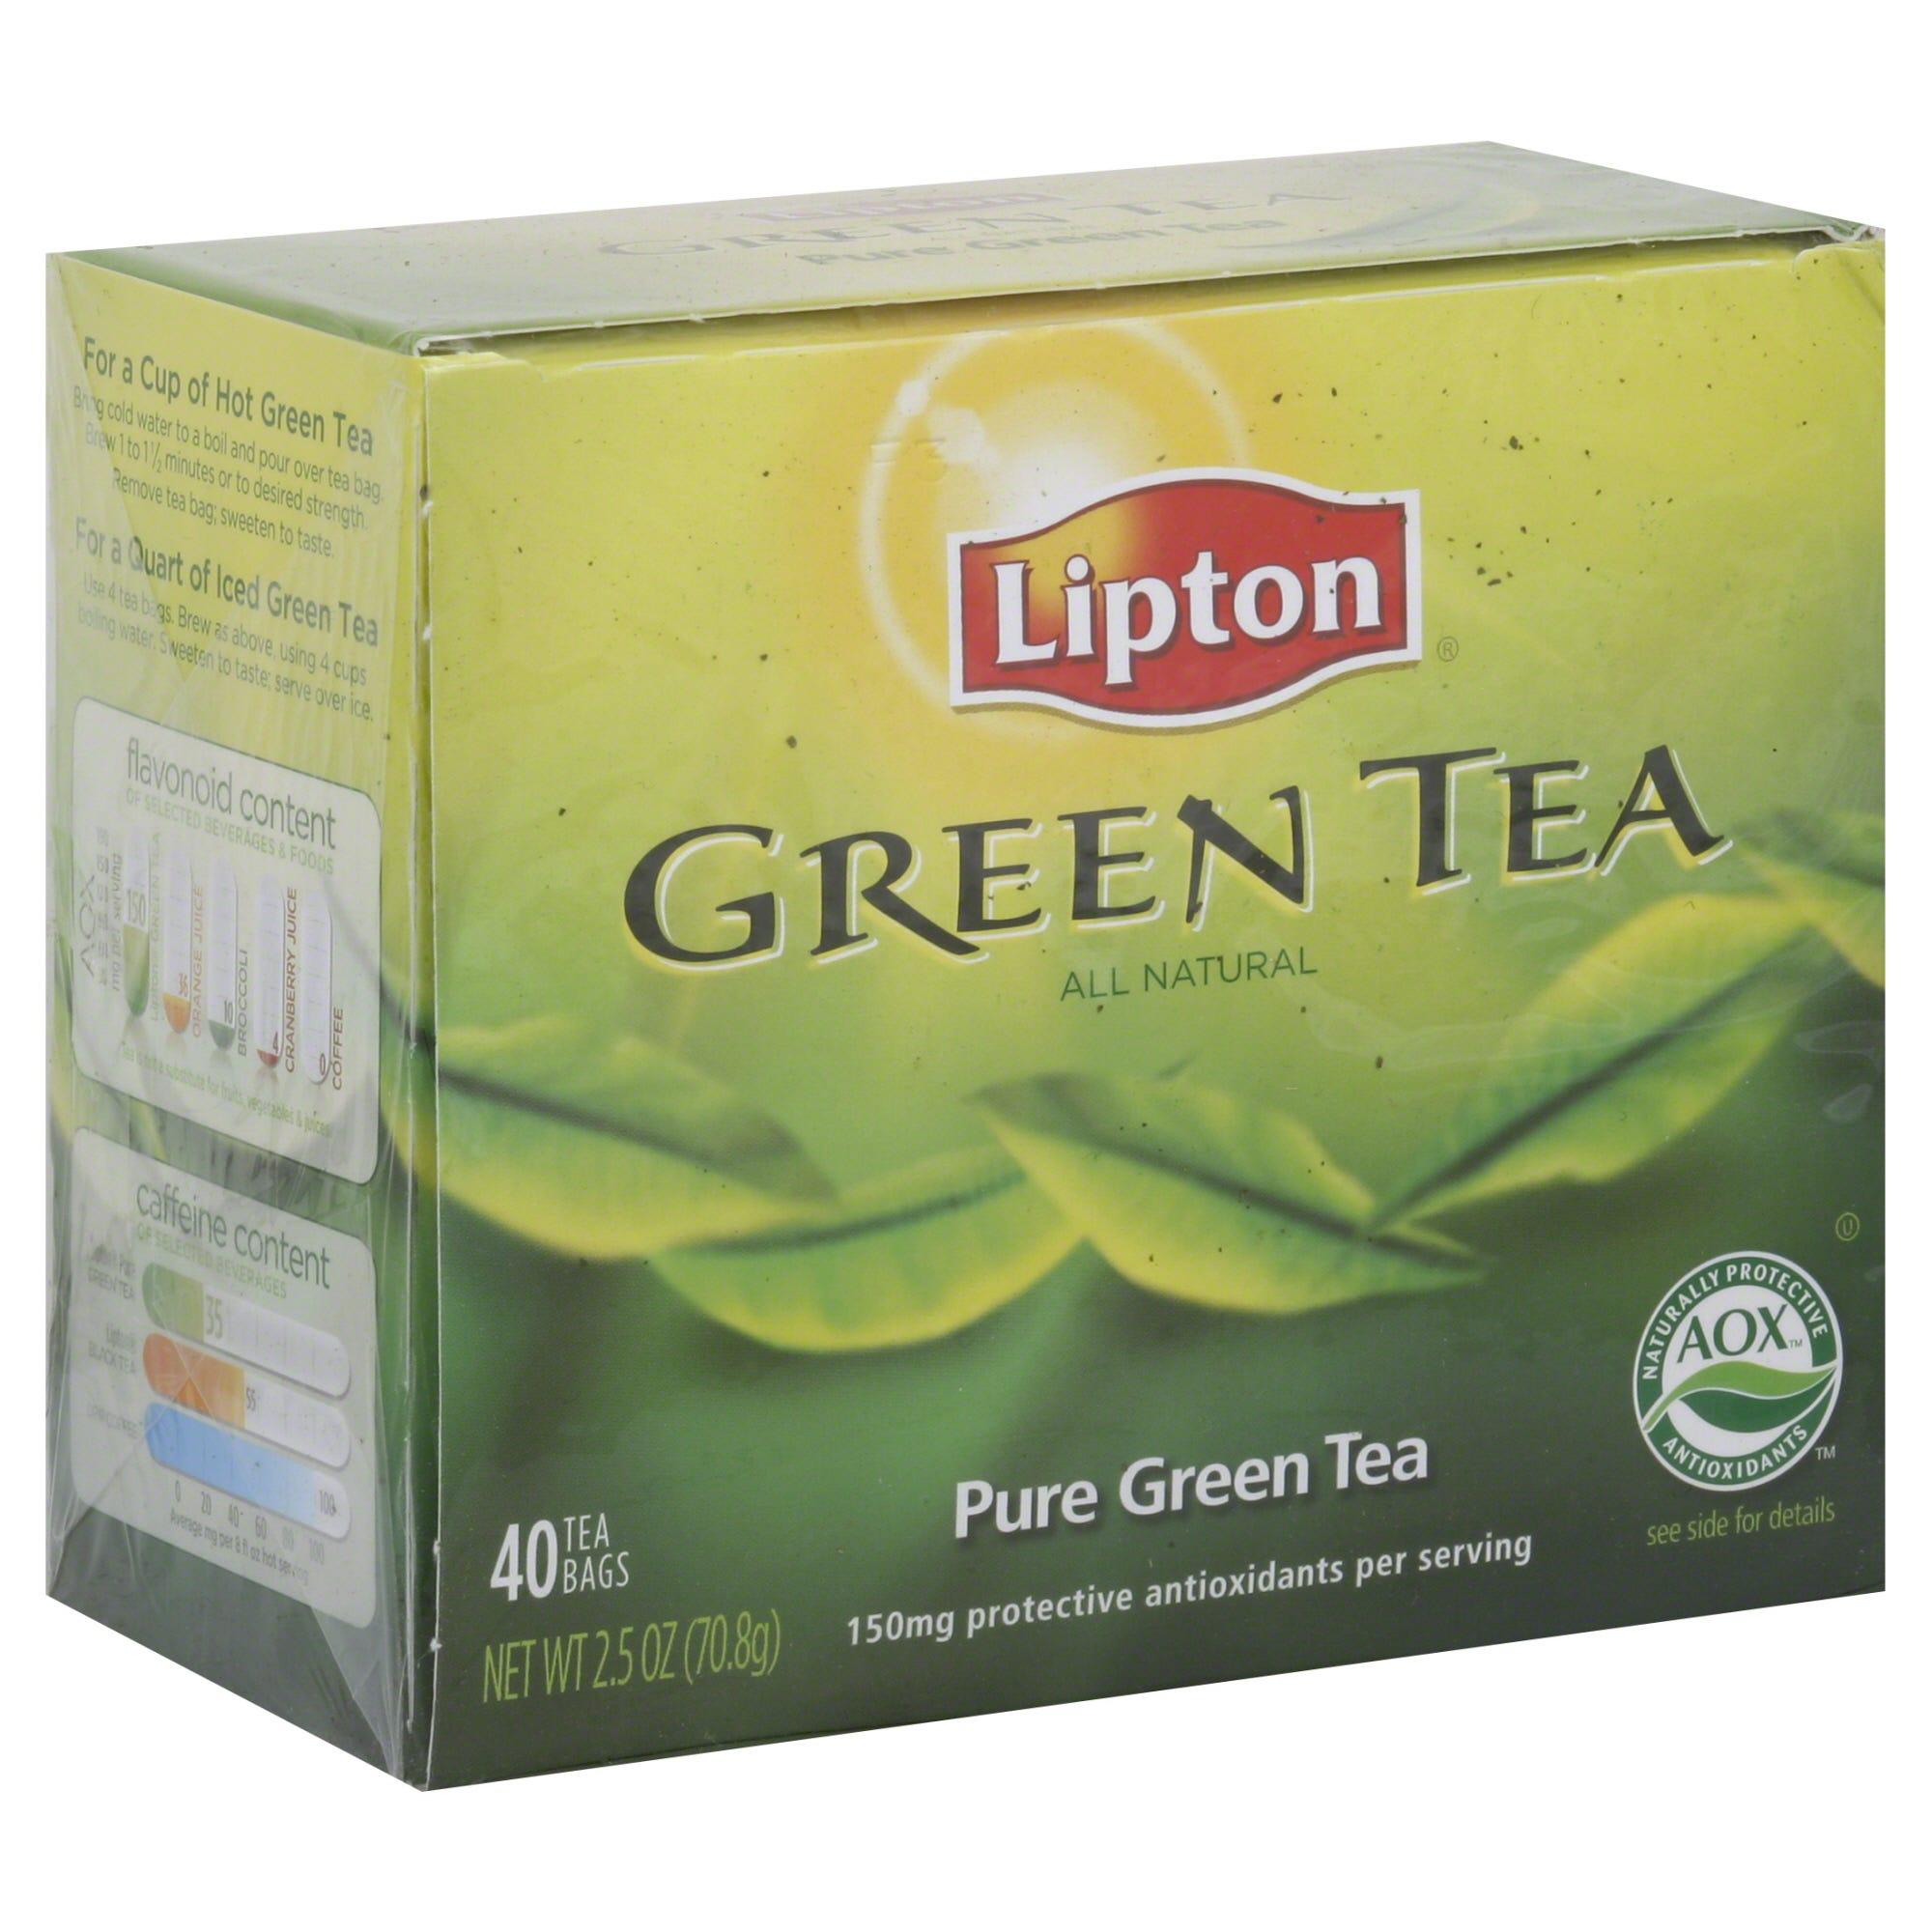 Lipton Green Tea, Pure 40 bags 2.5 oz